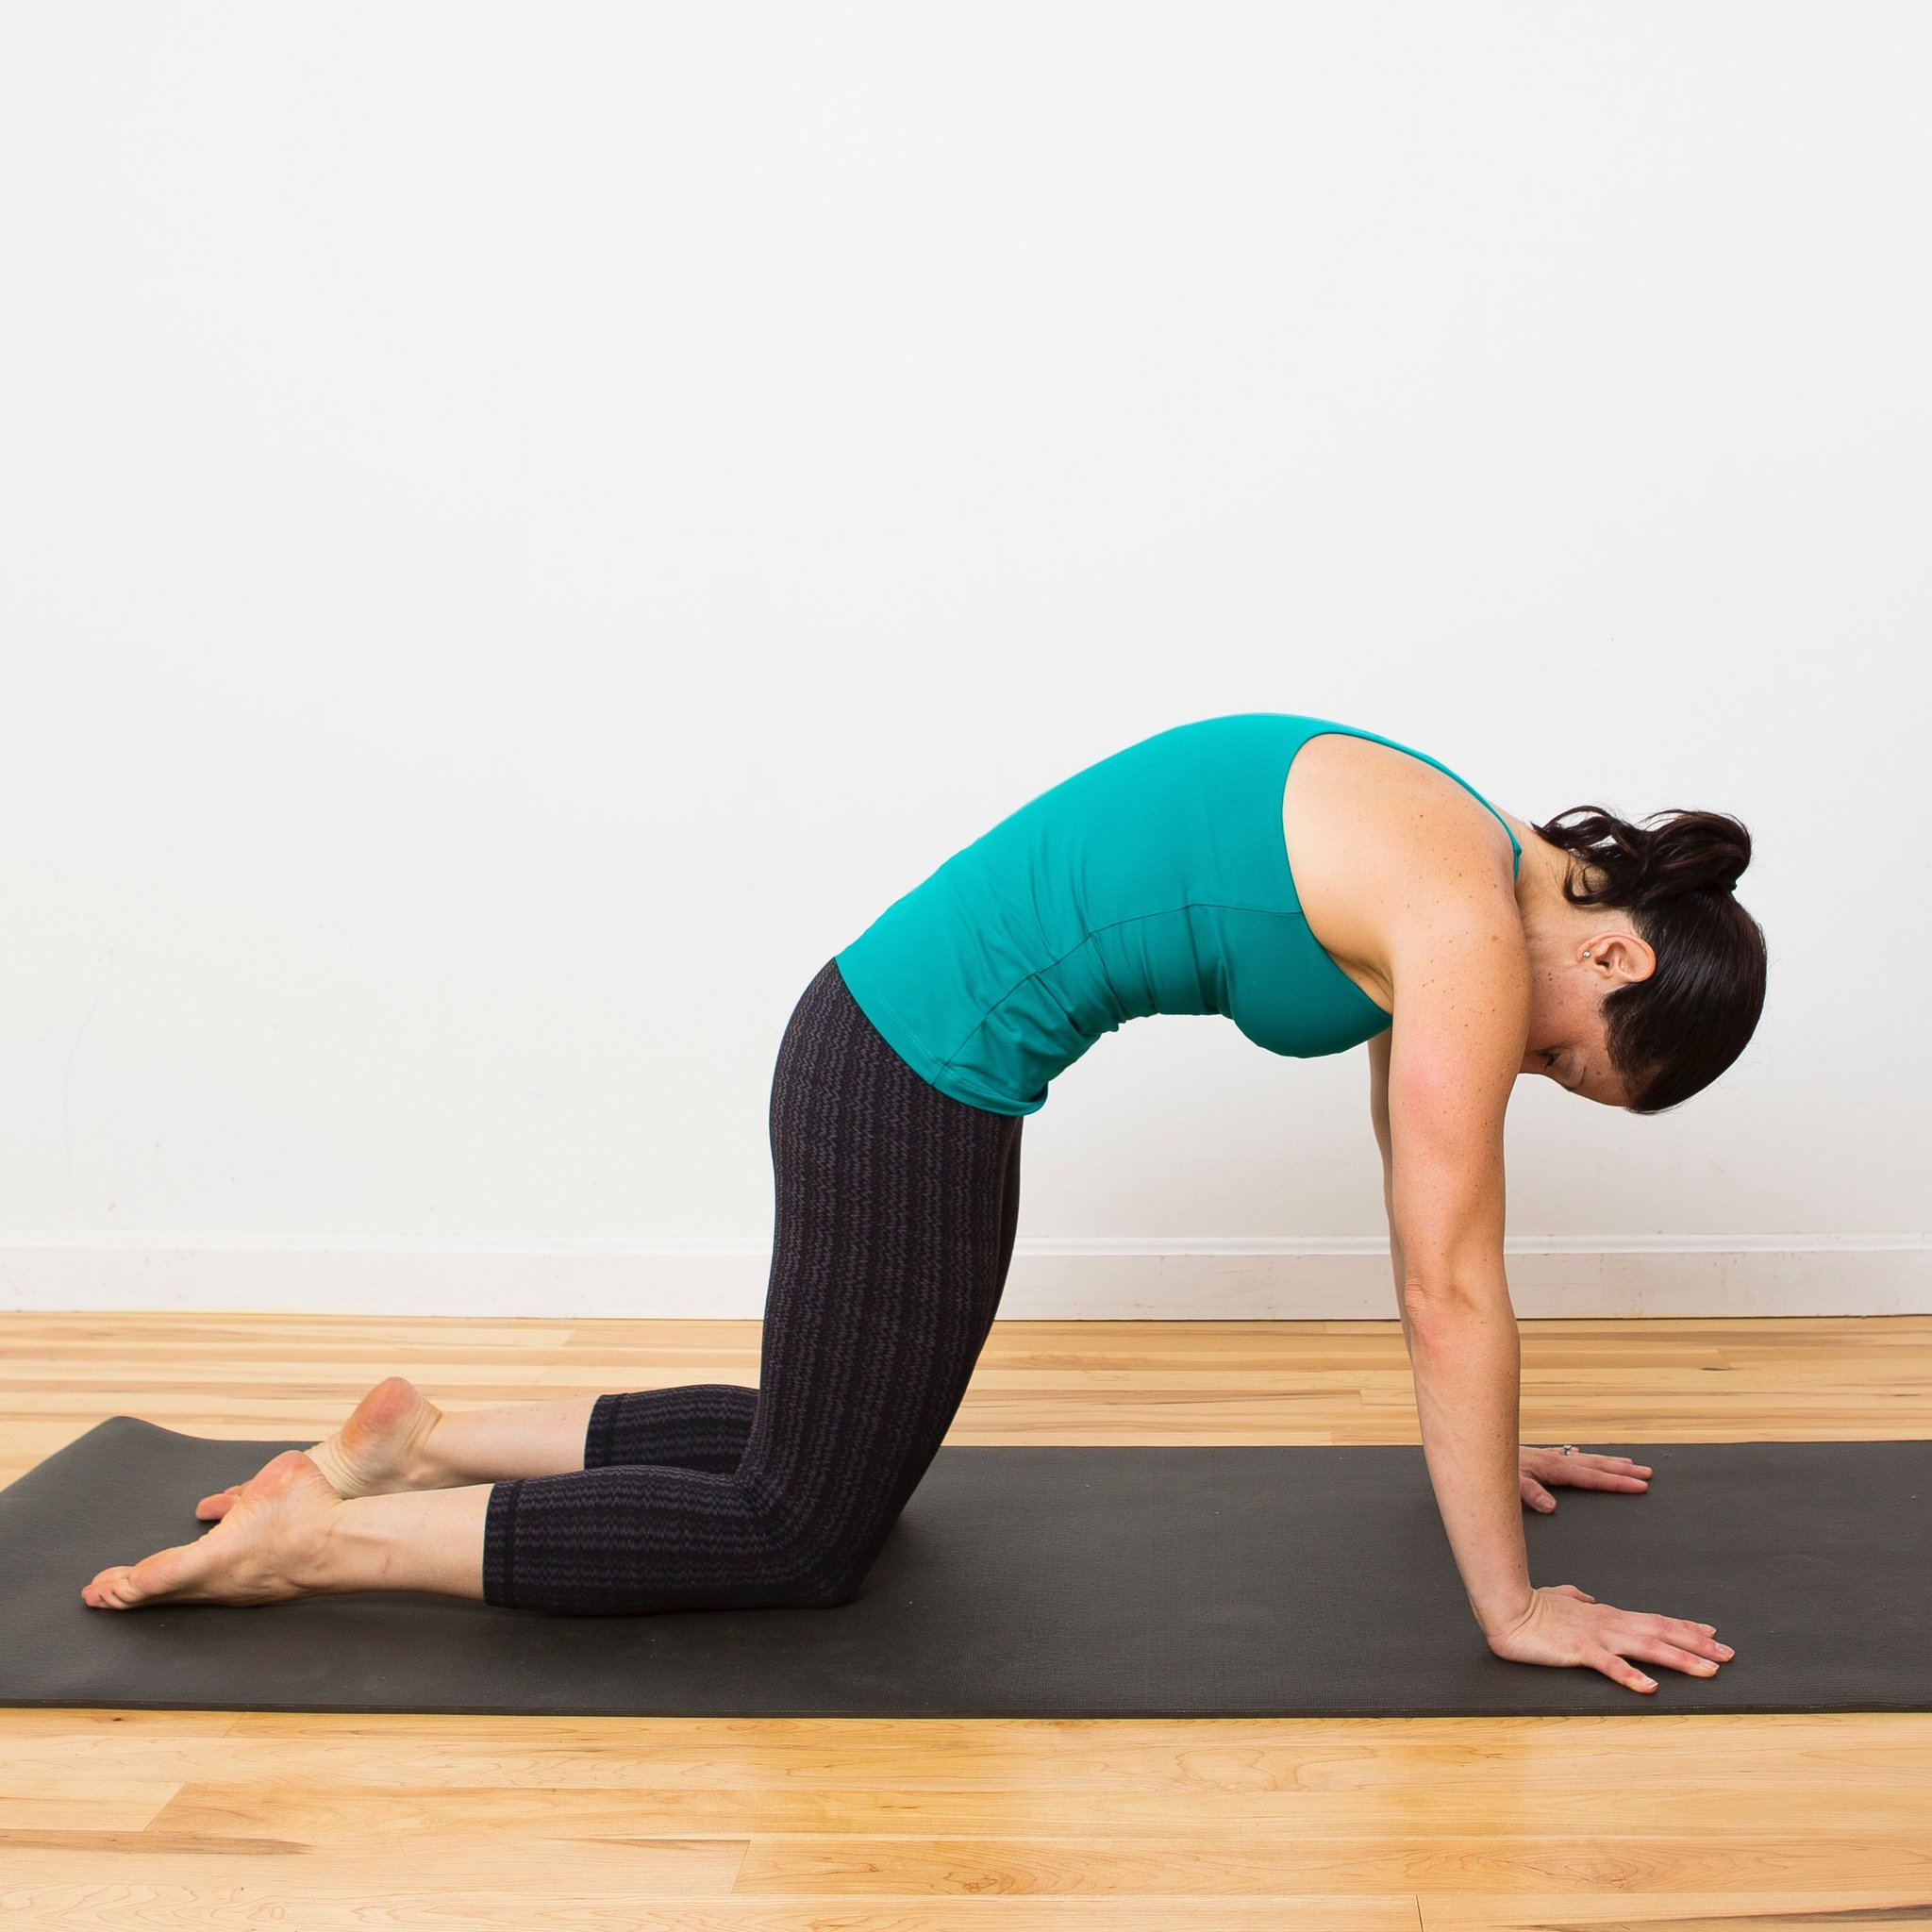 Weight Loss Kundalini Yoga Follow Gurmukh to Experience It